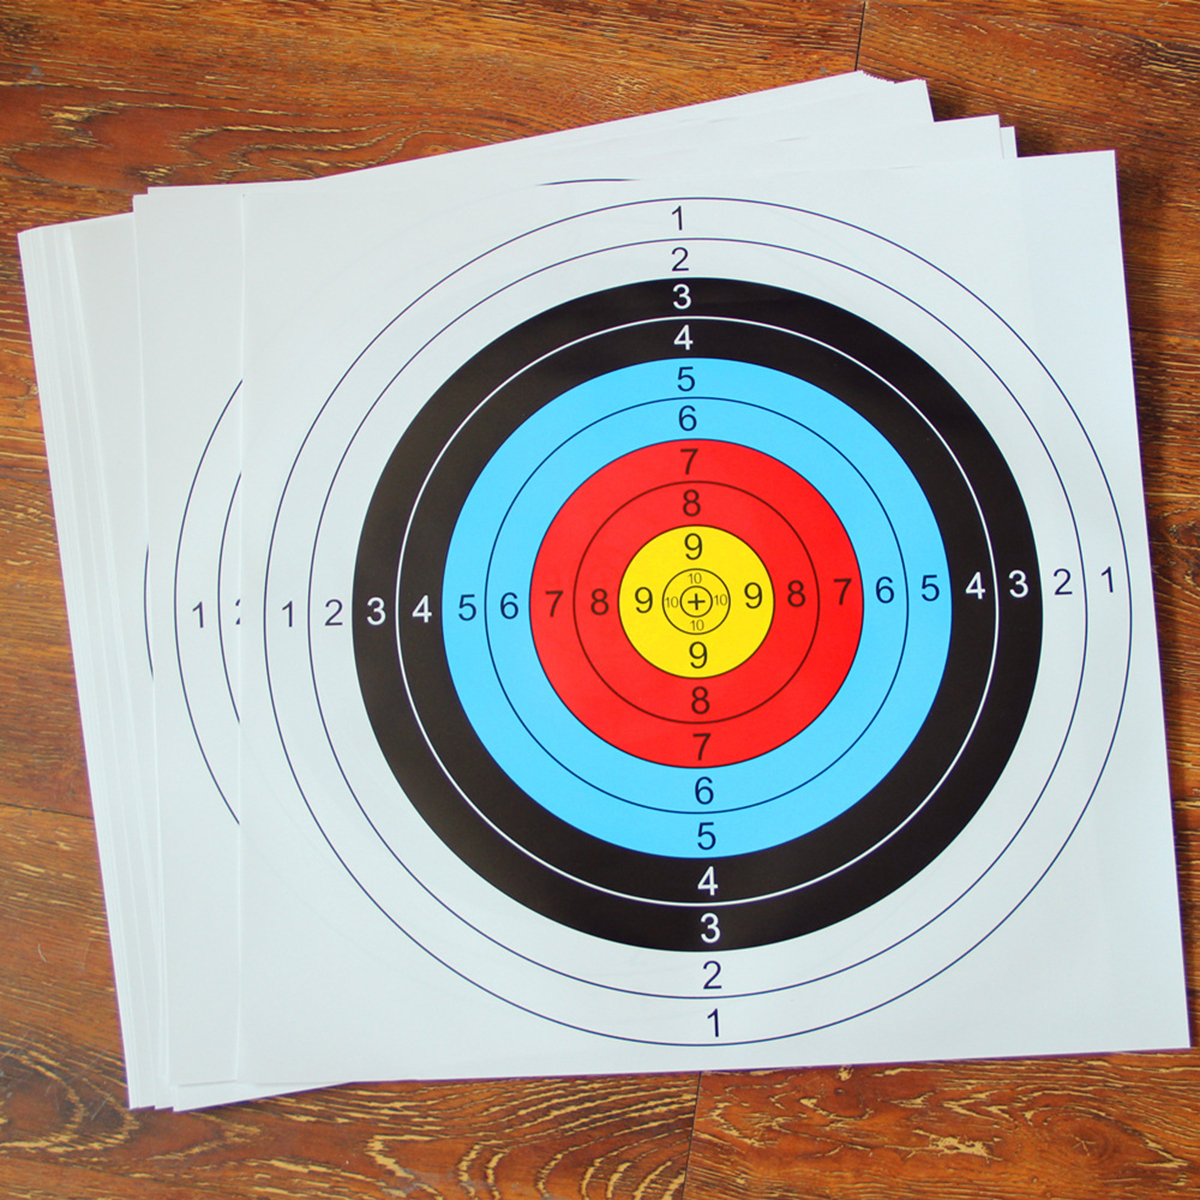 New 30pcs 40*40 Cm Archery Shooting Target Paper Bow Hunting Archery Kit Standard Full Ring Single Spot Shooting Training Paper